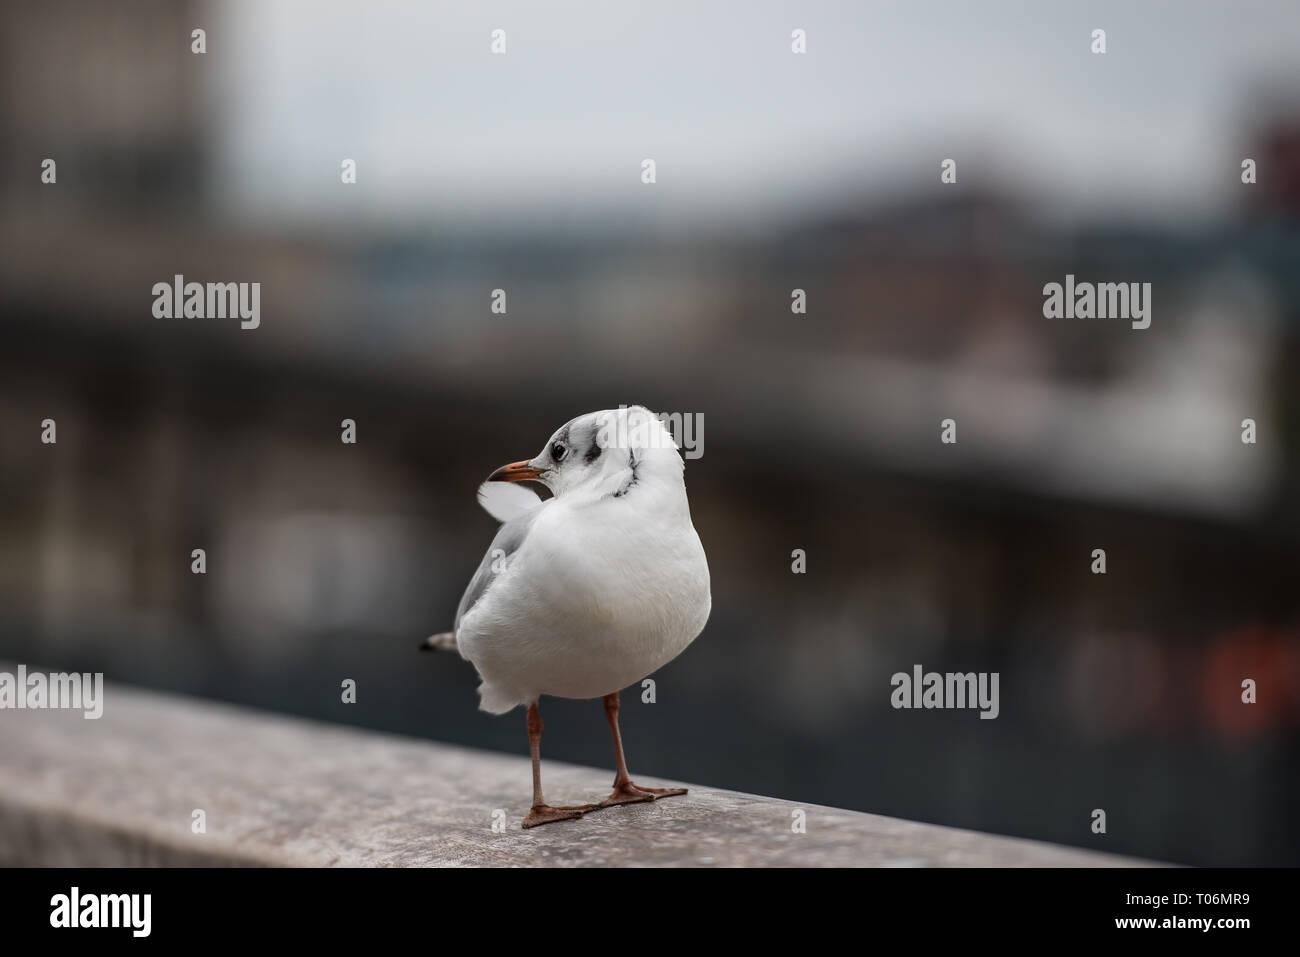 Black-headed gull on banks of river Thames in winter plumage - Stock Image